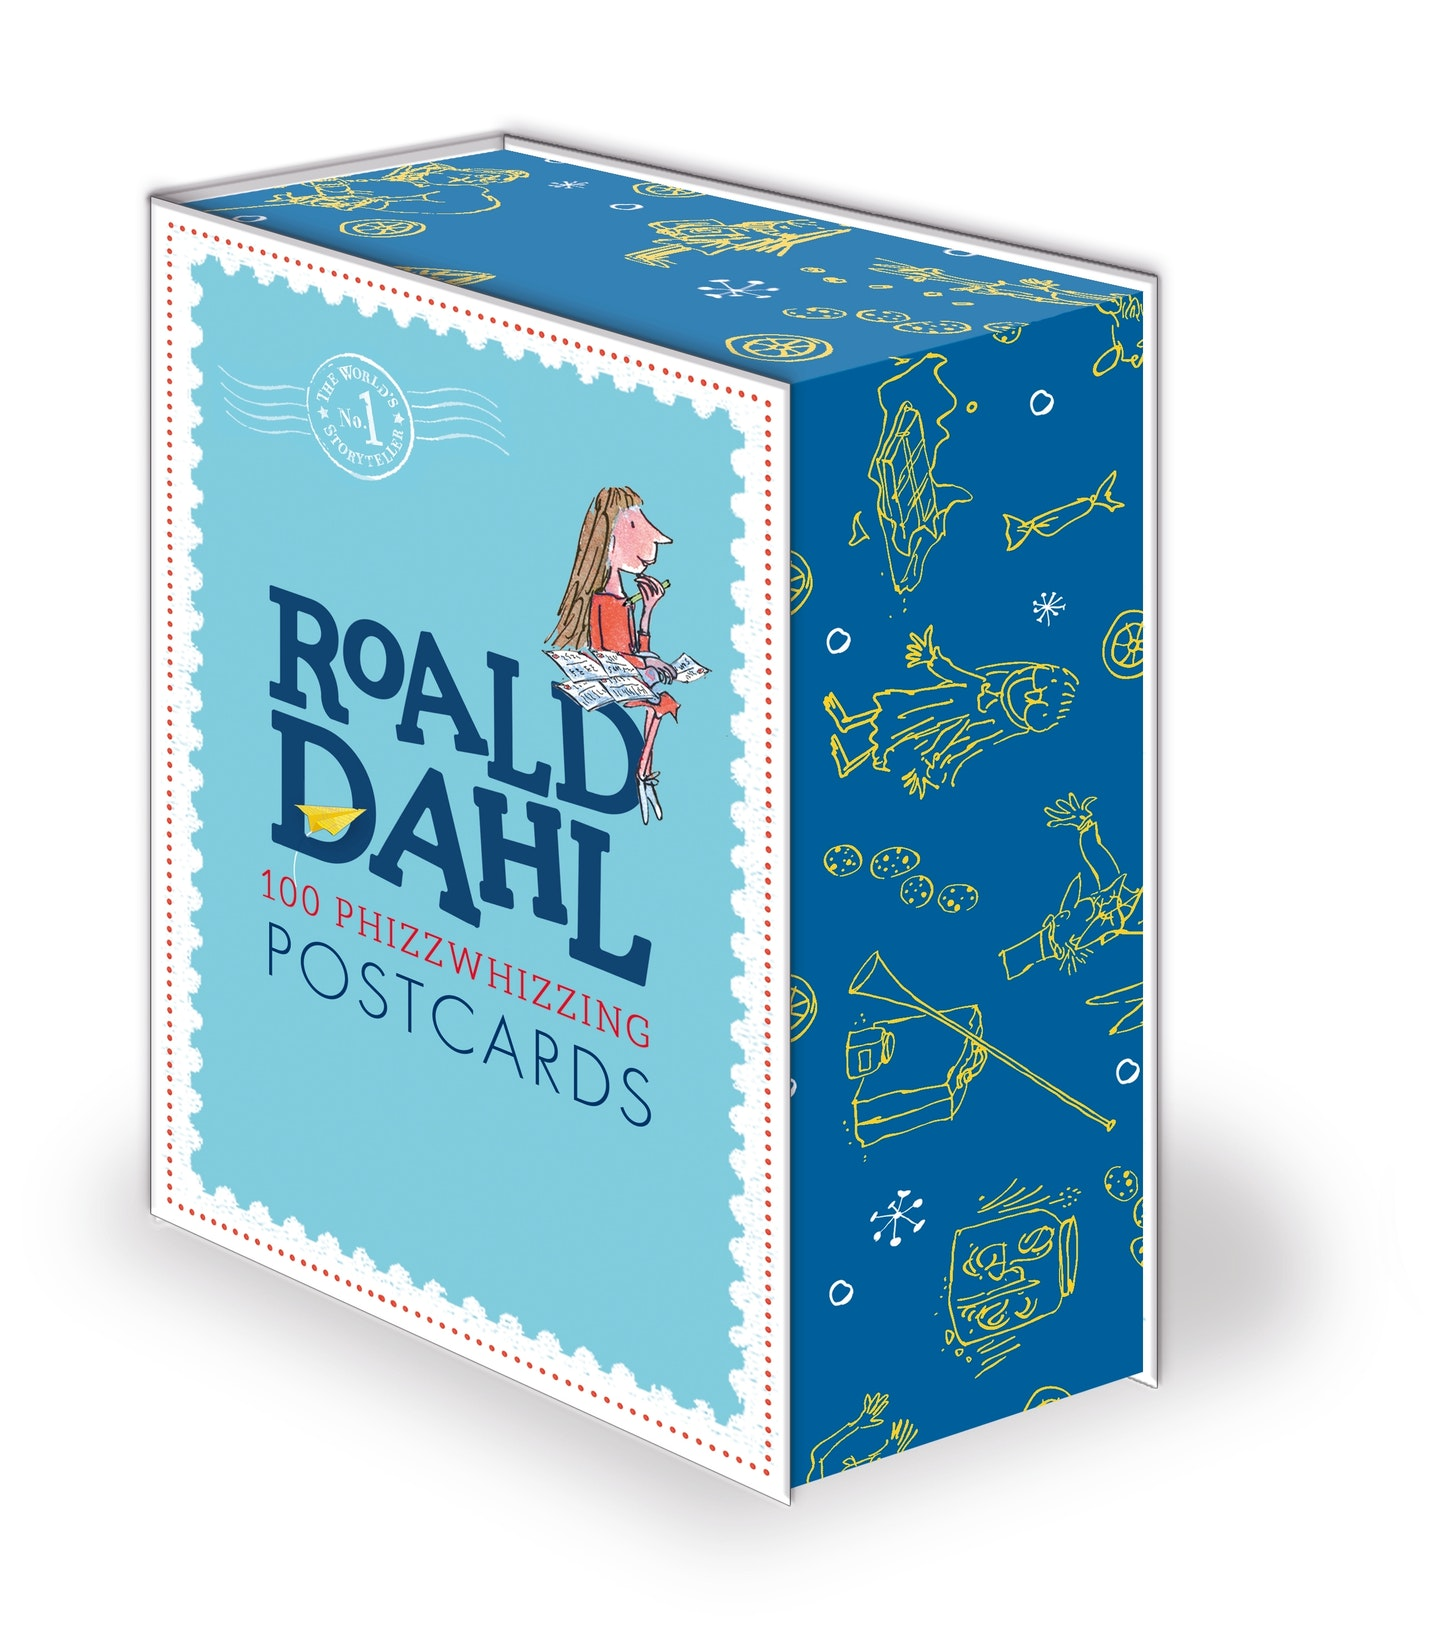 Classic Book Cover Postcards ~ Roald dahl postcard box penguin books australia